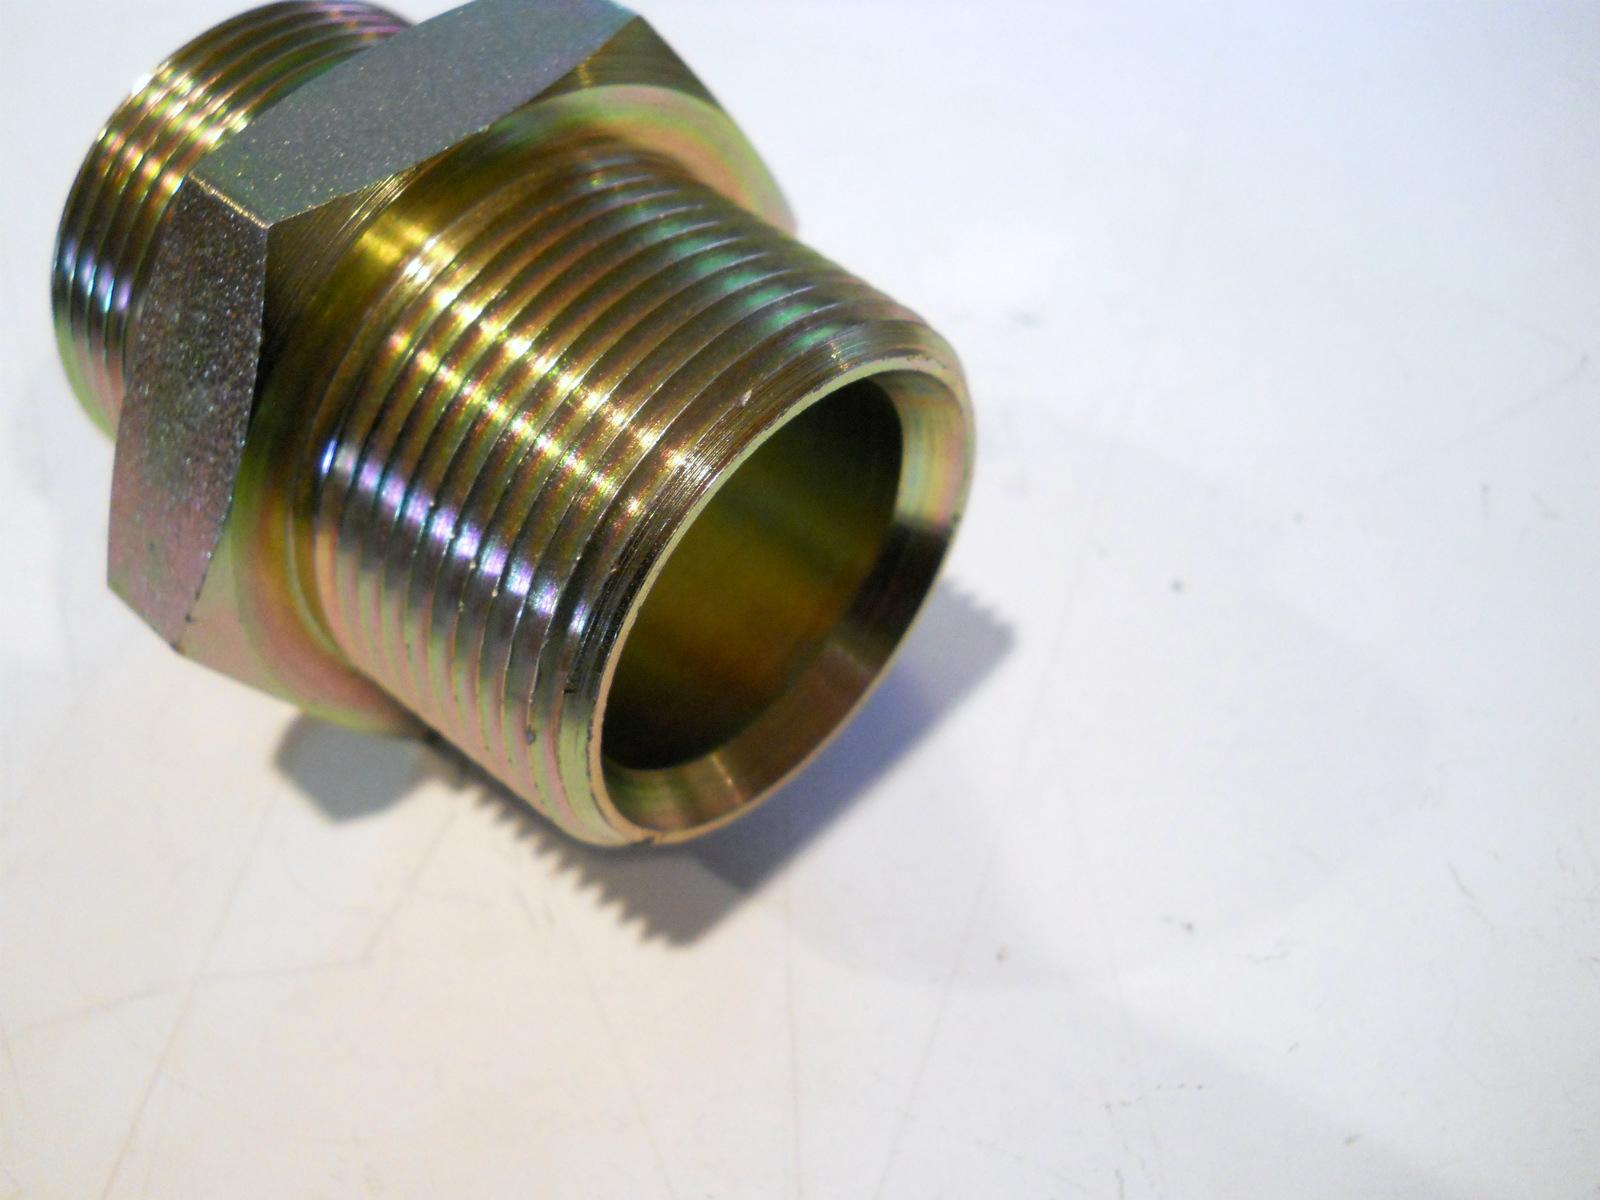 New quot steel male adapter bspp npt fmk plourde